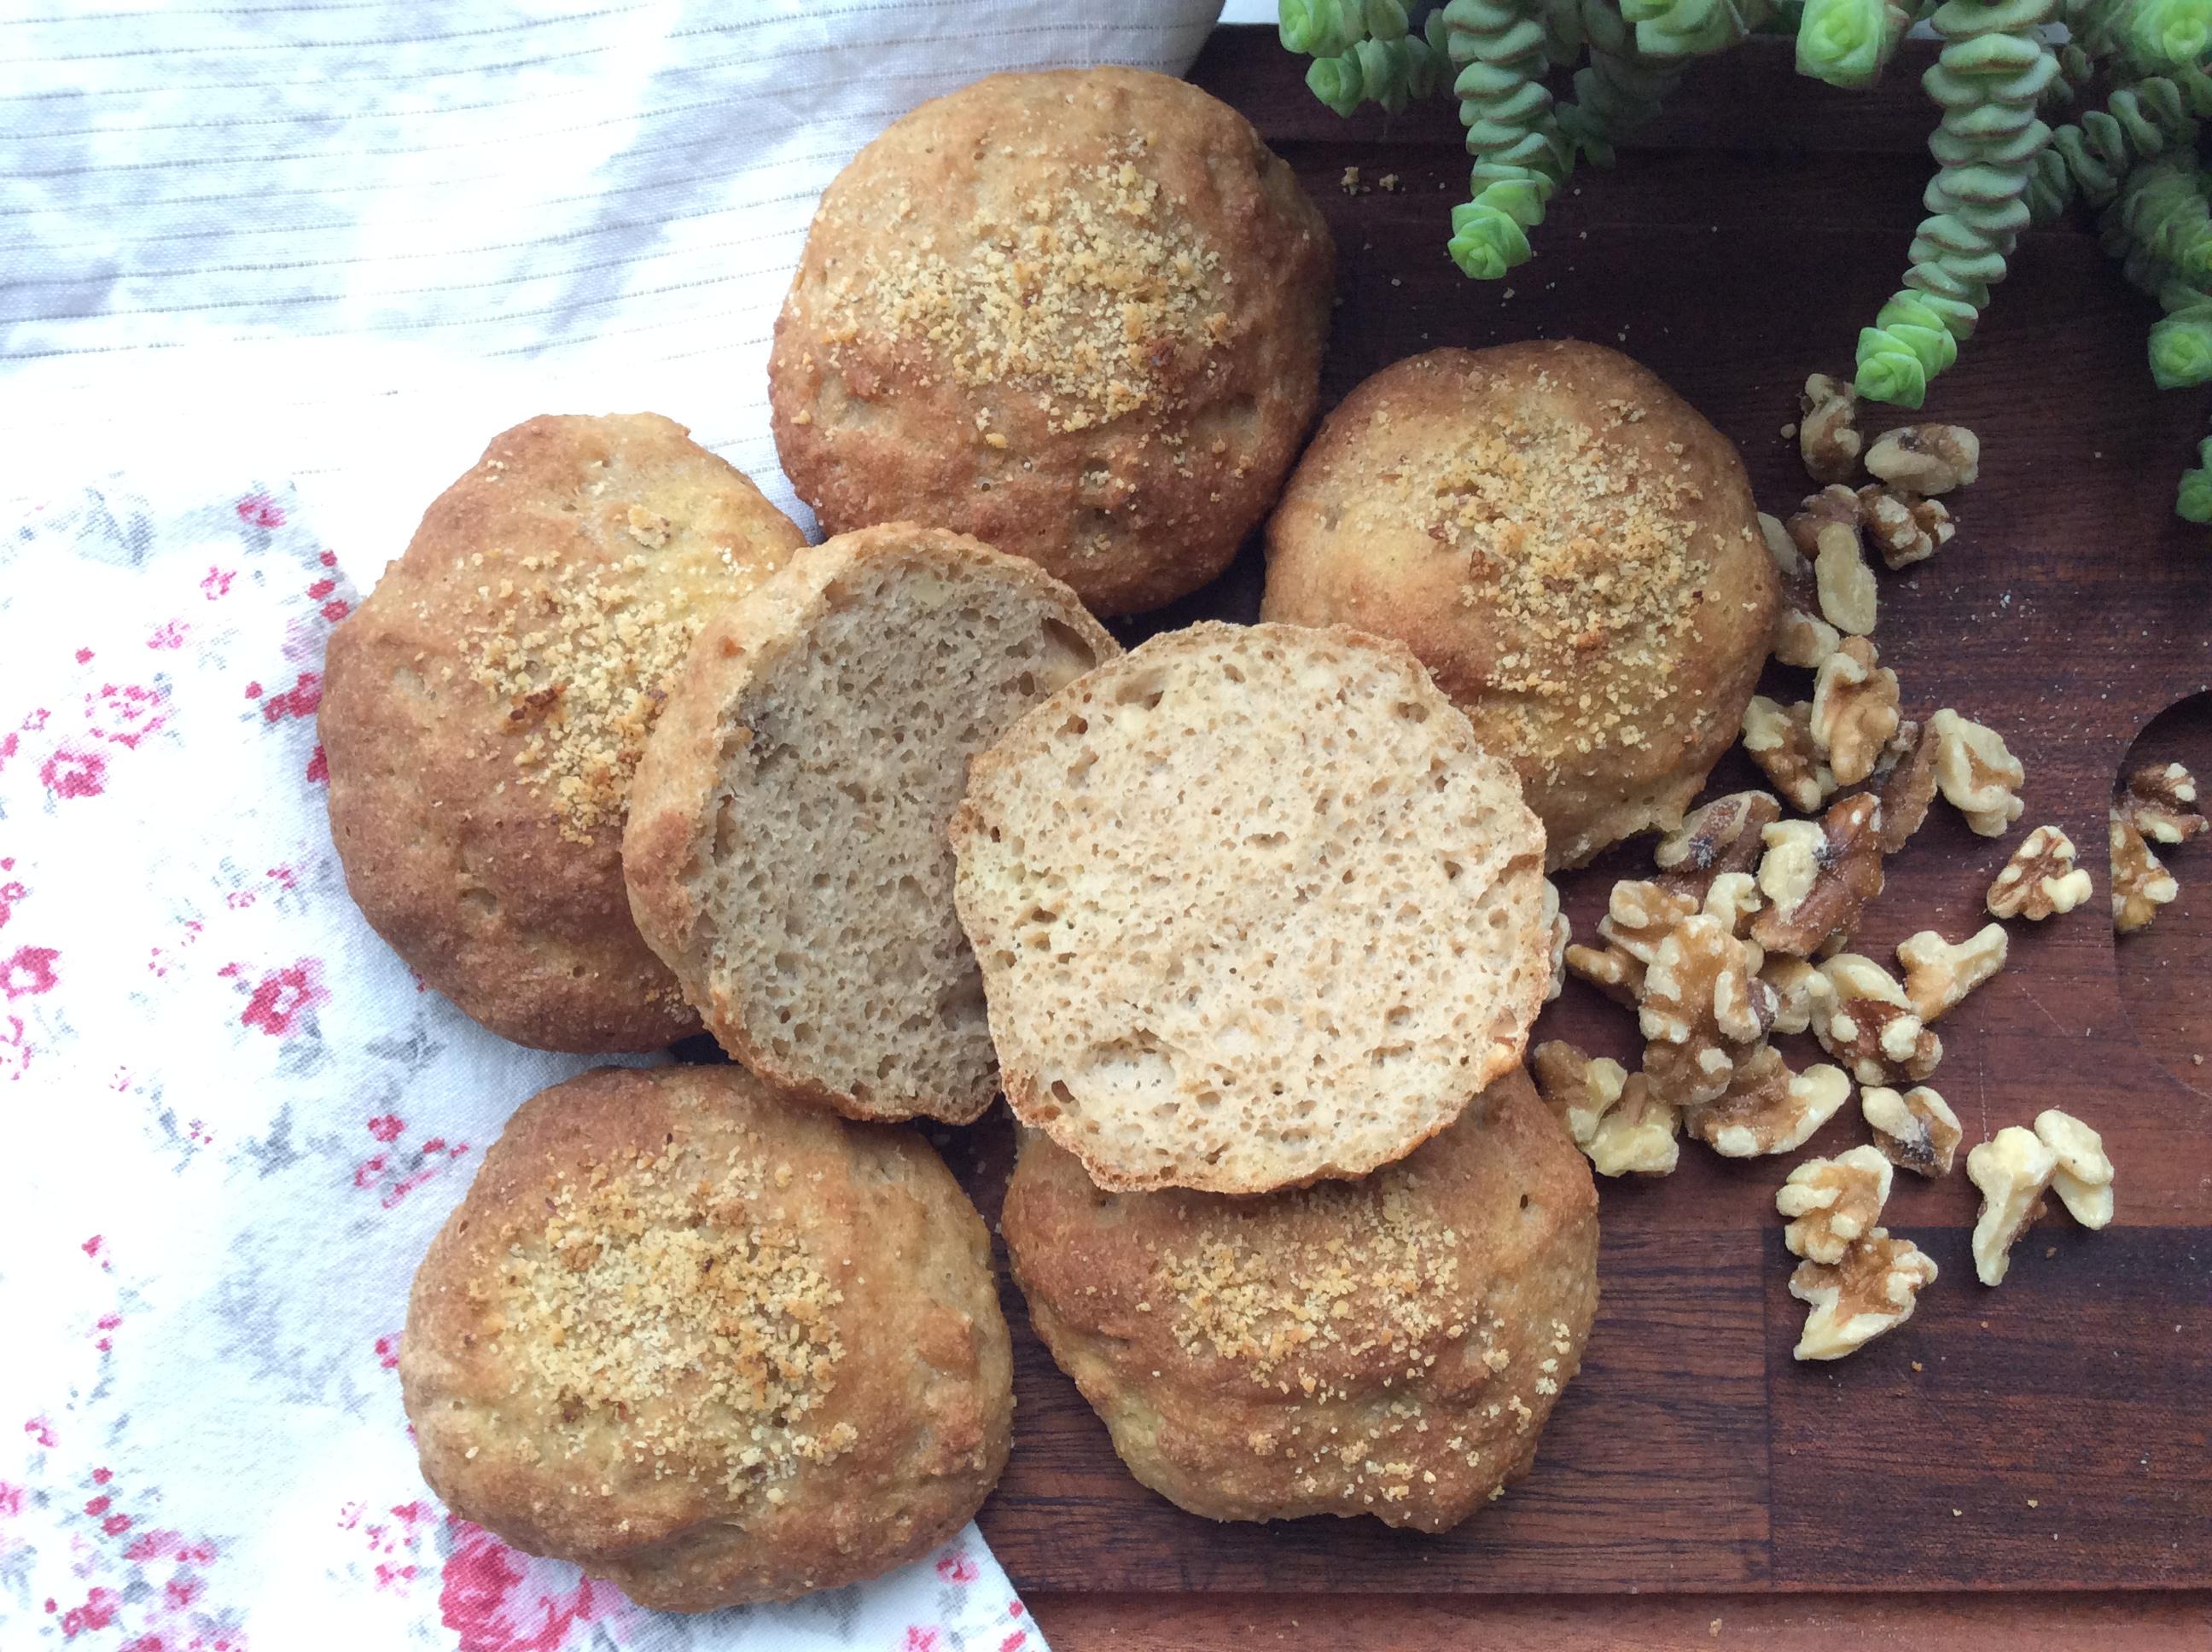 Glutenfri valnøddeboller med havre- og majsmel